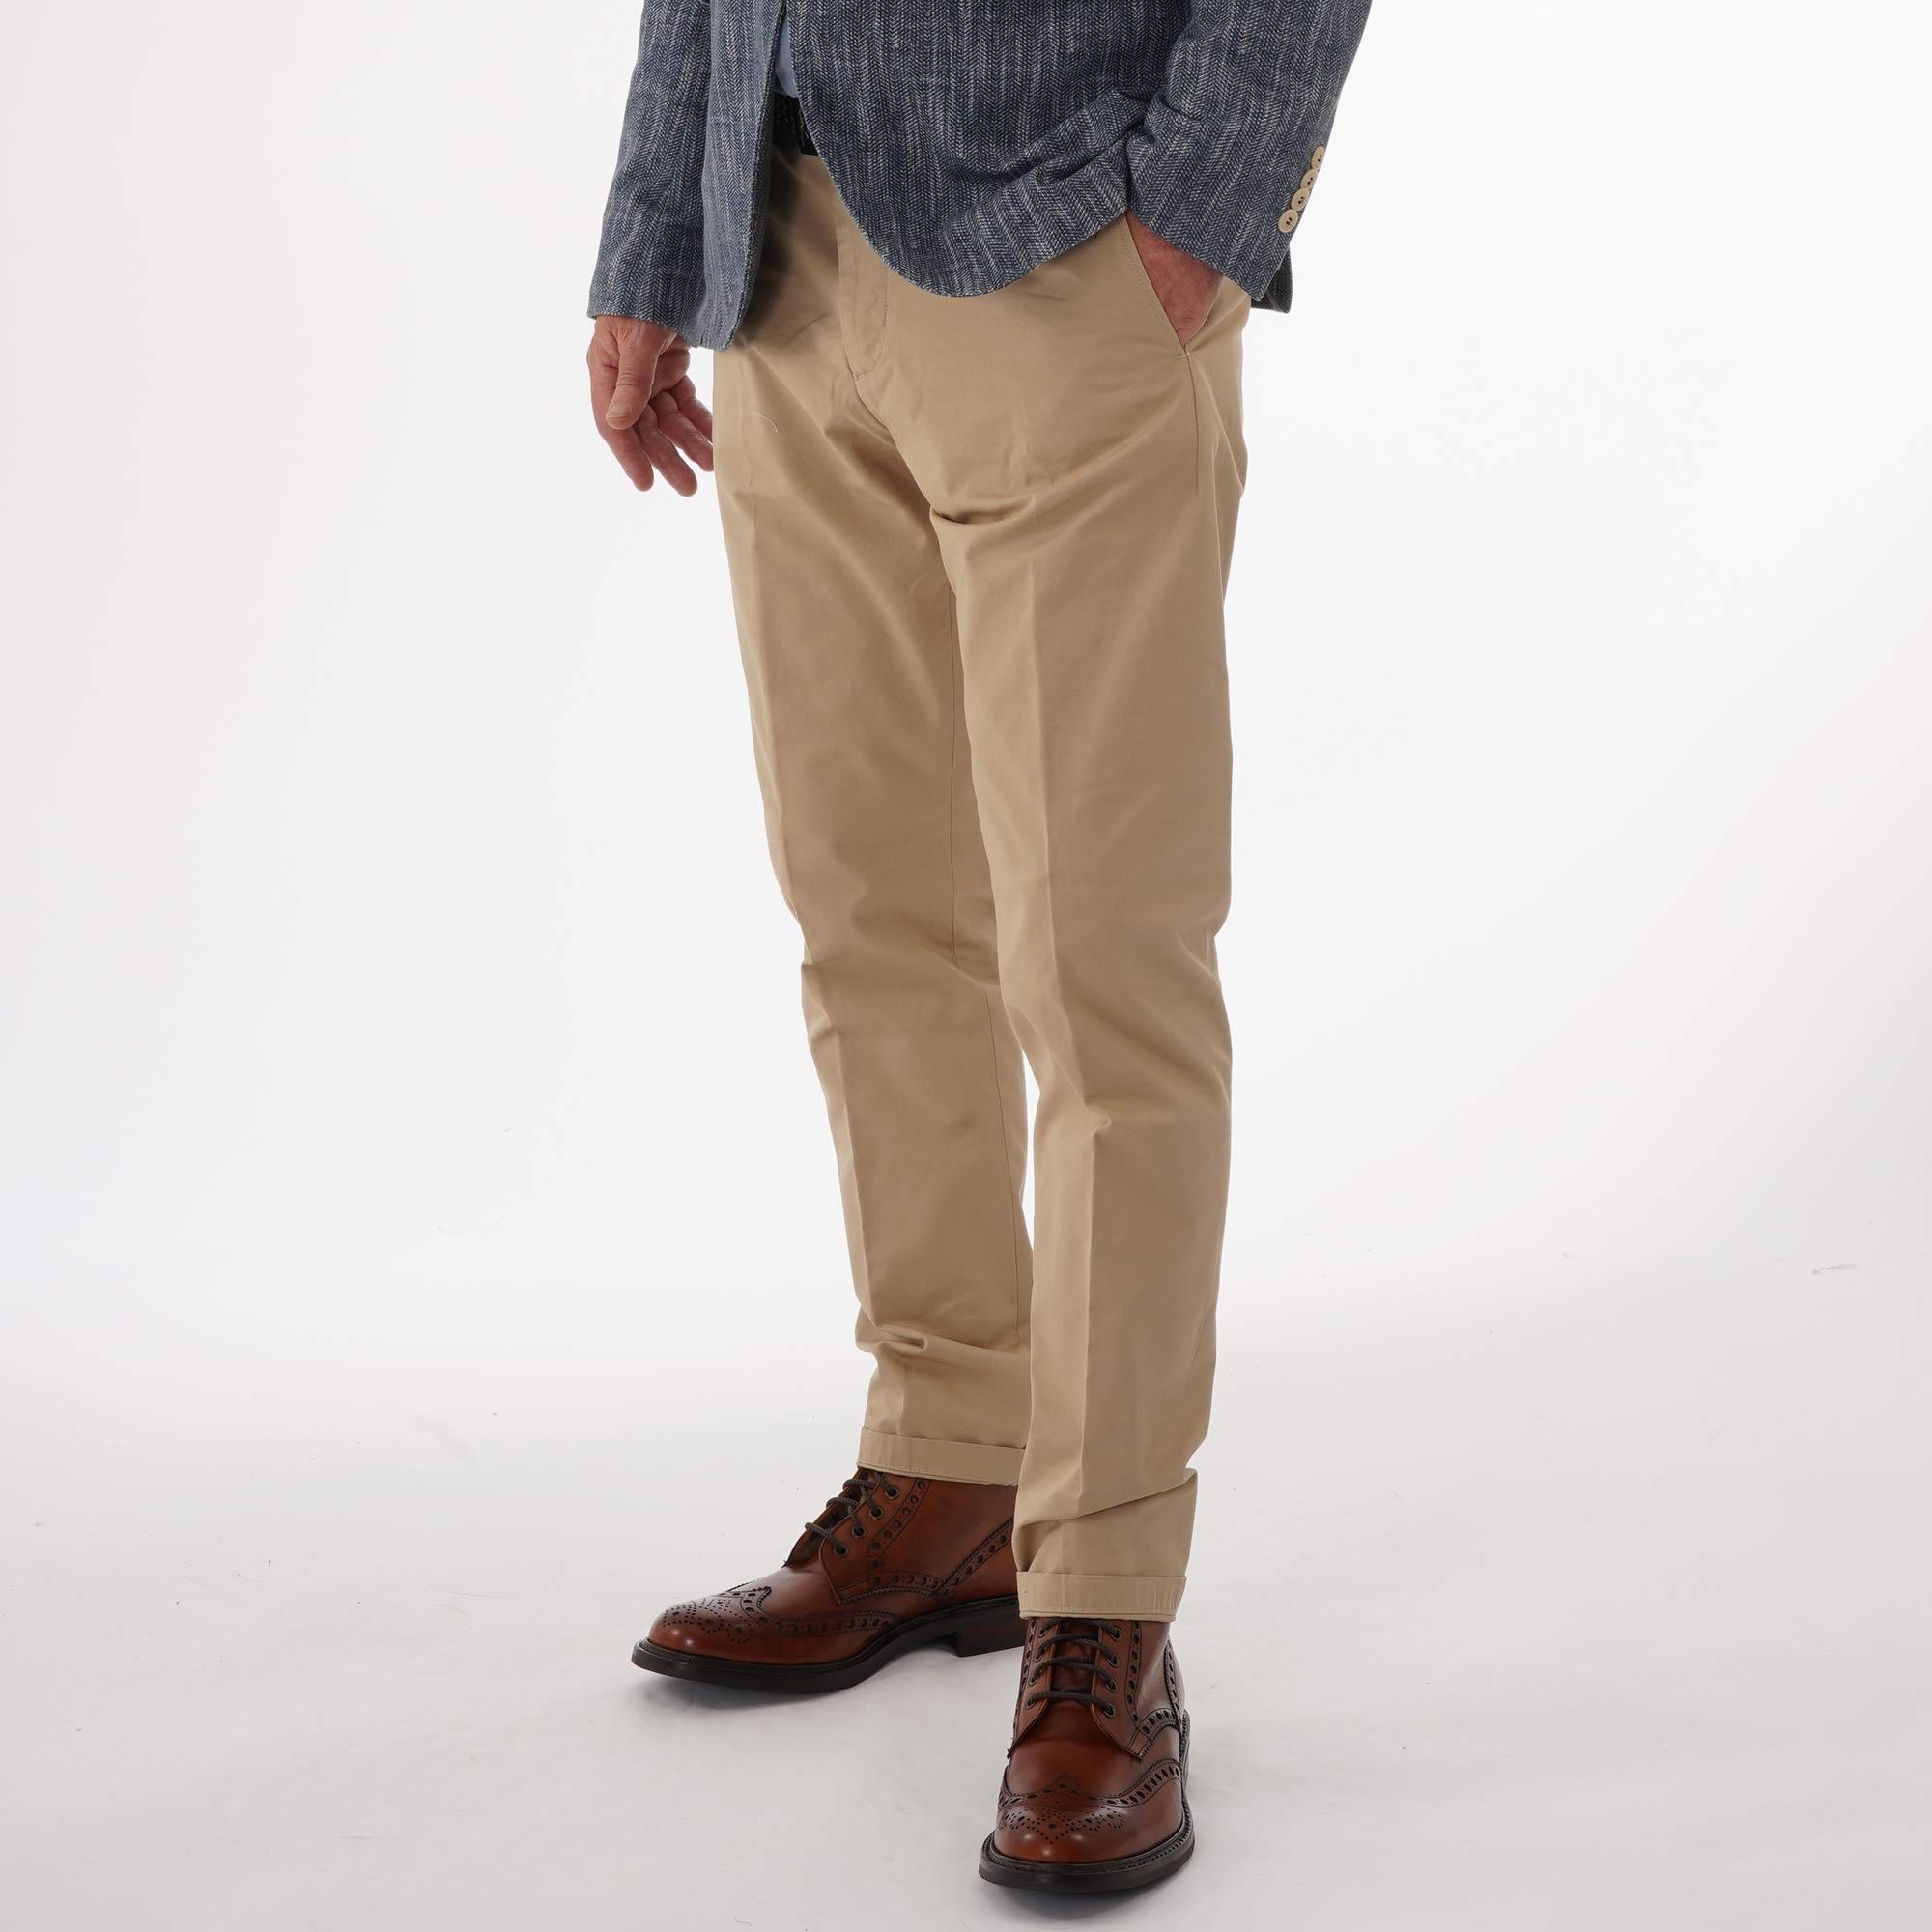 Levi S 502 True Chino Trousers Harvest Gold Wonderknit 521630004